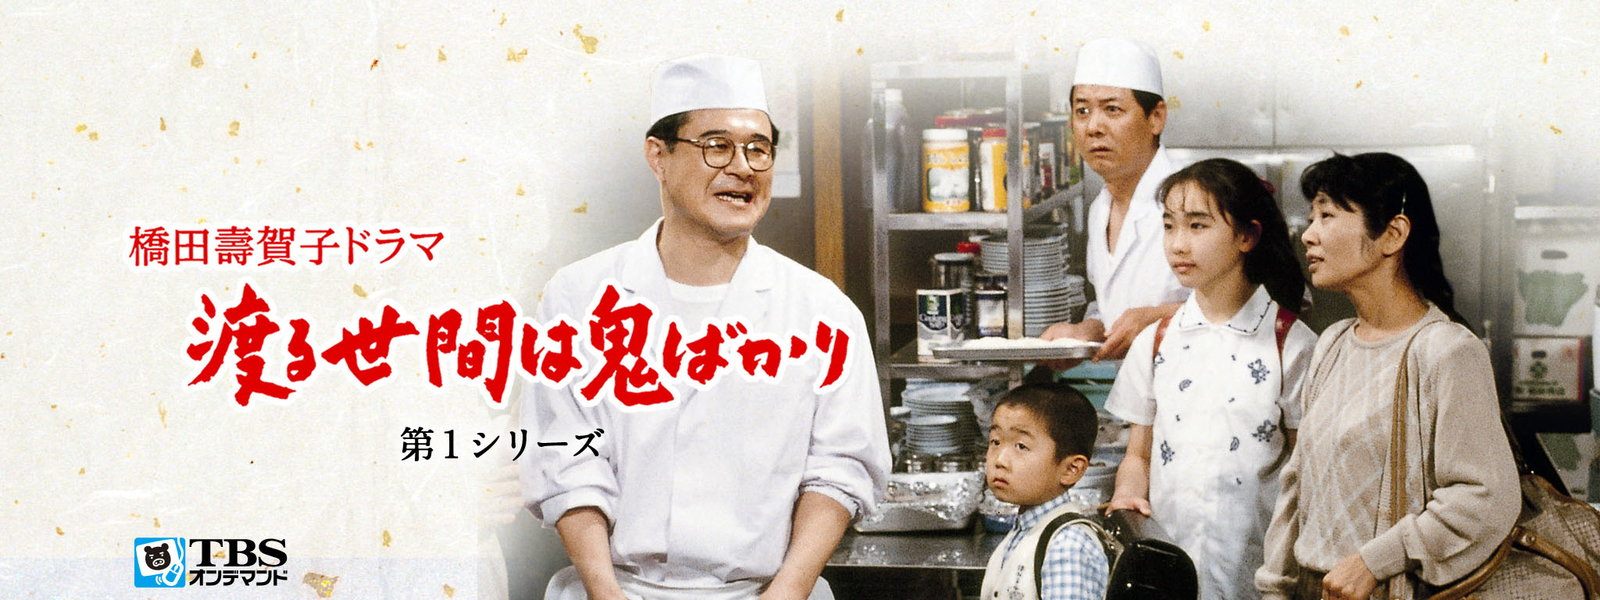 NAVER まとめdTV(dビデオ)無料期間で観た面白かった映画/ドラマ